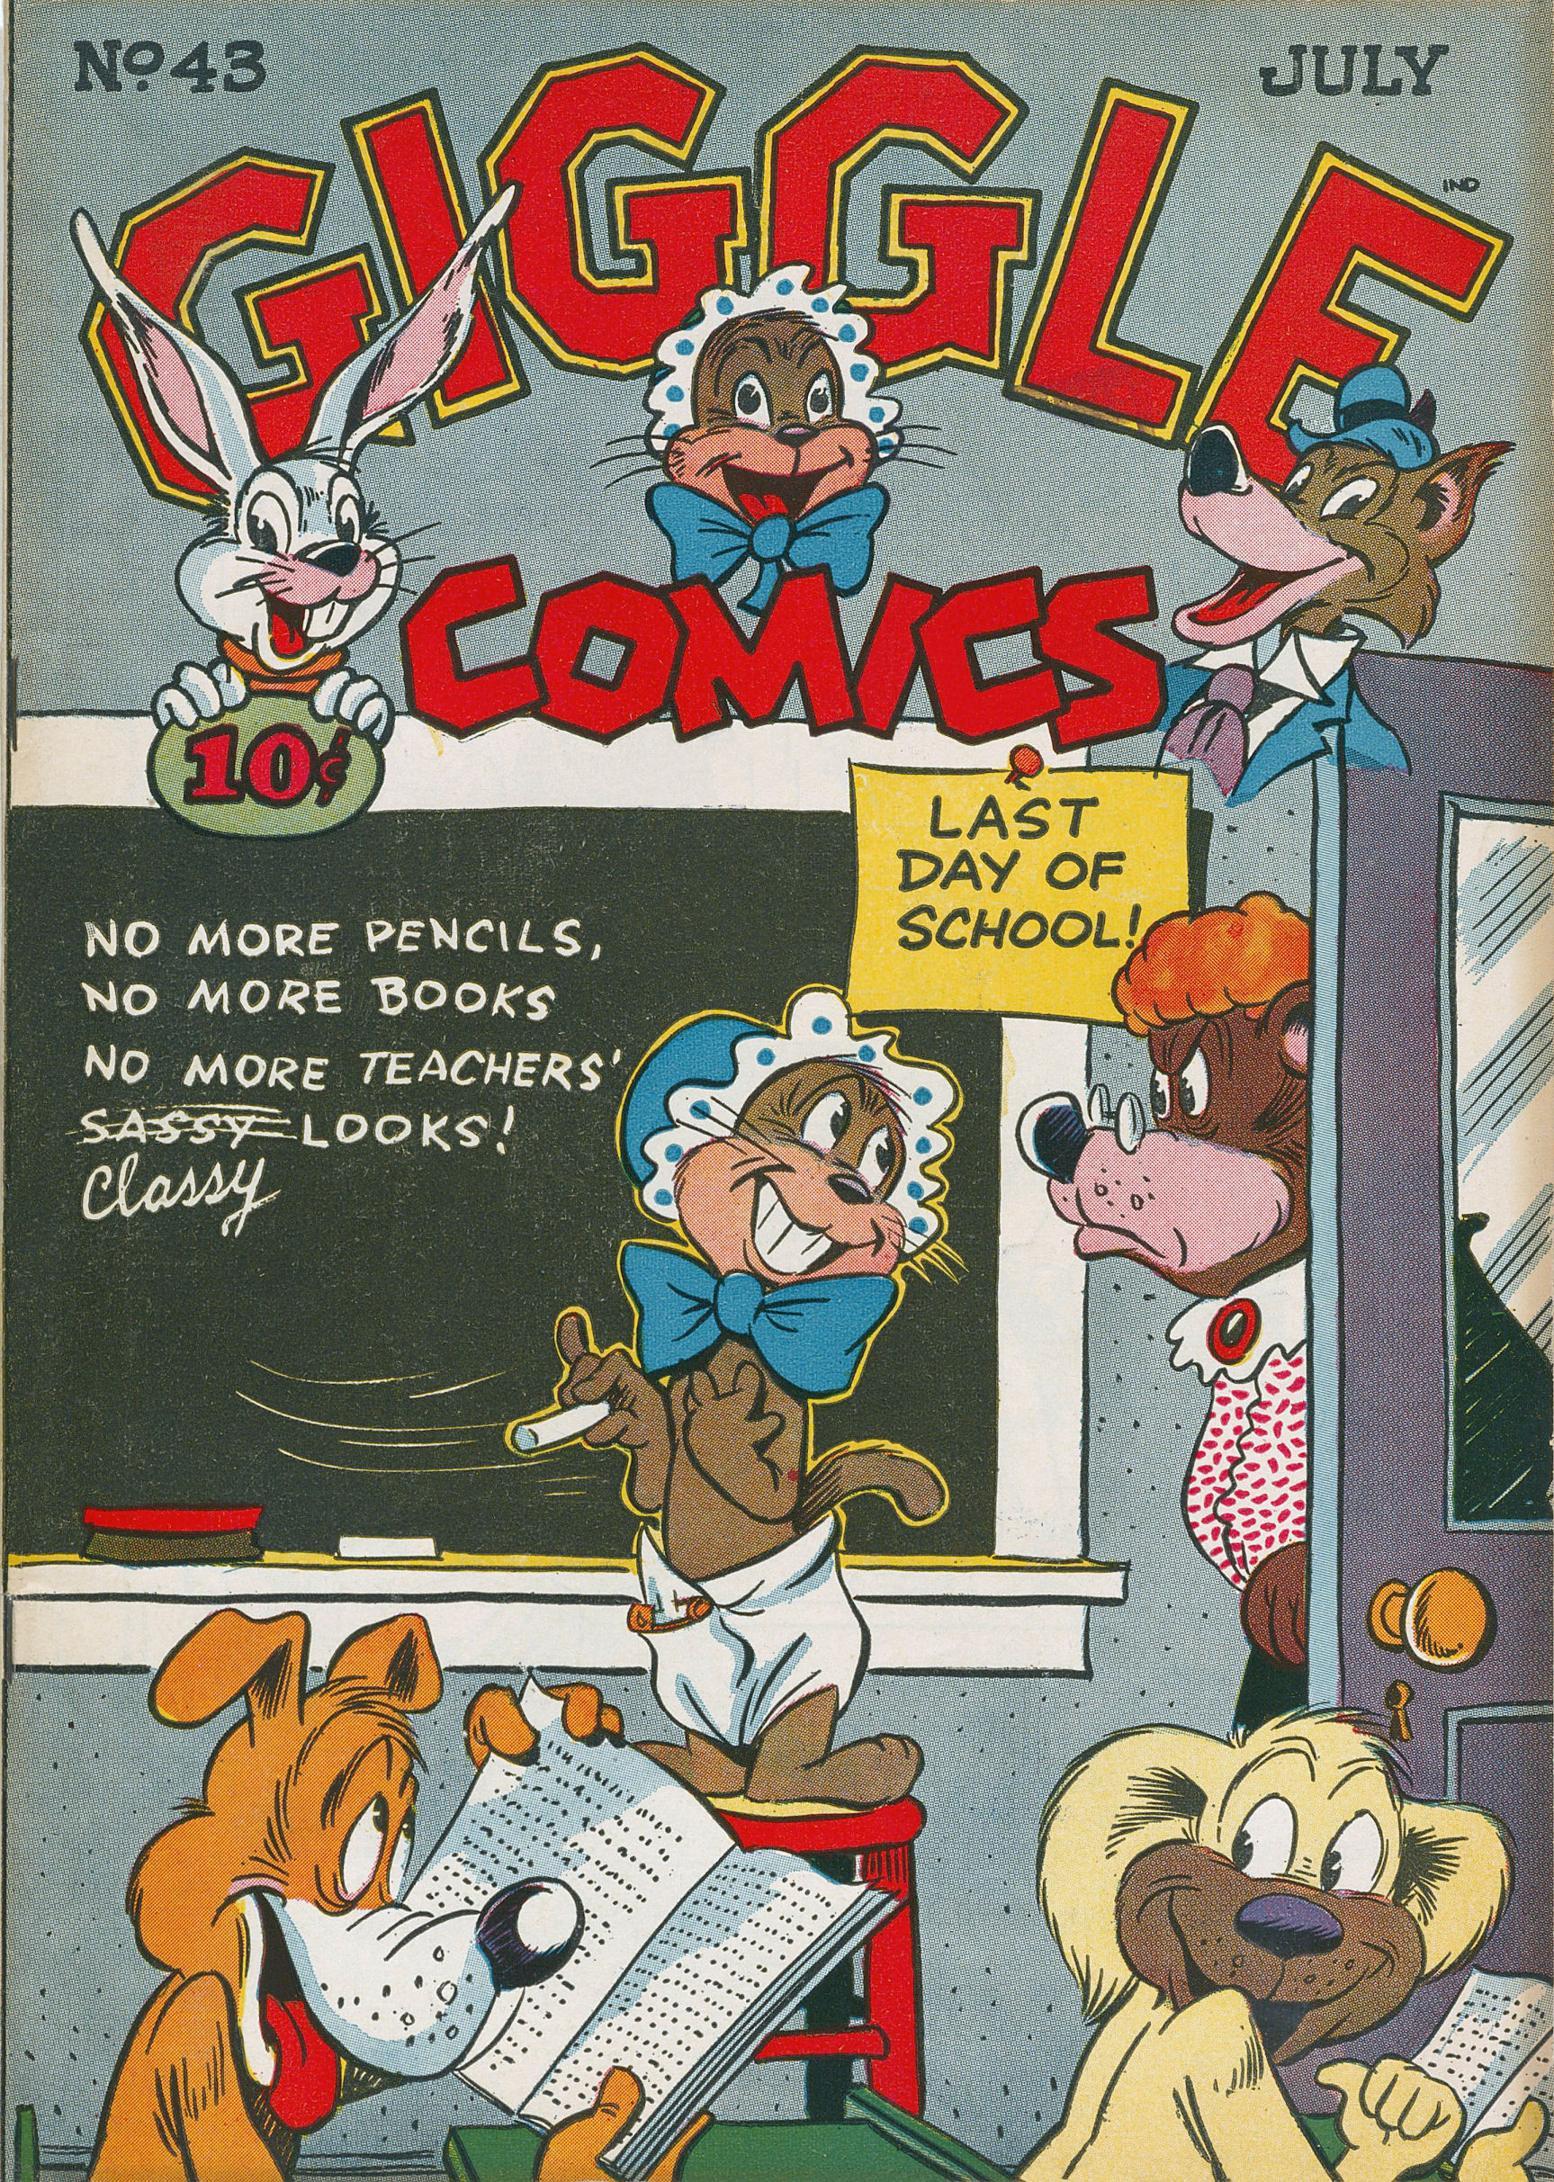 Giggle Comics 043 ACG Jul 1947 c2c titansfan+Conan the Librarian